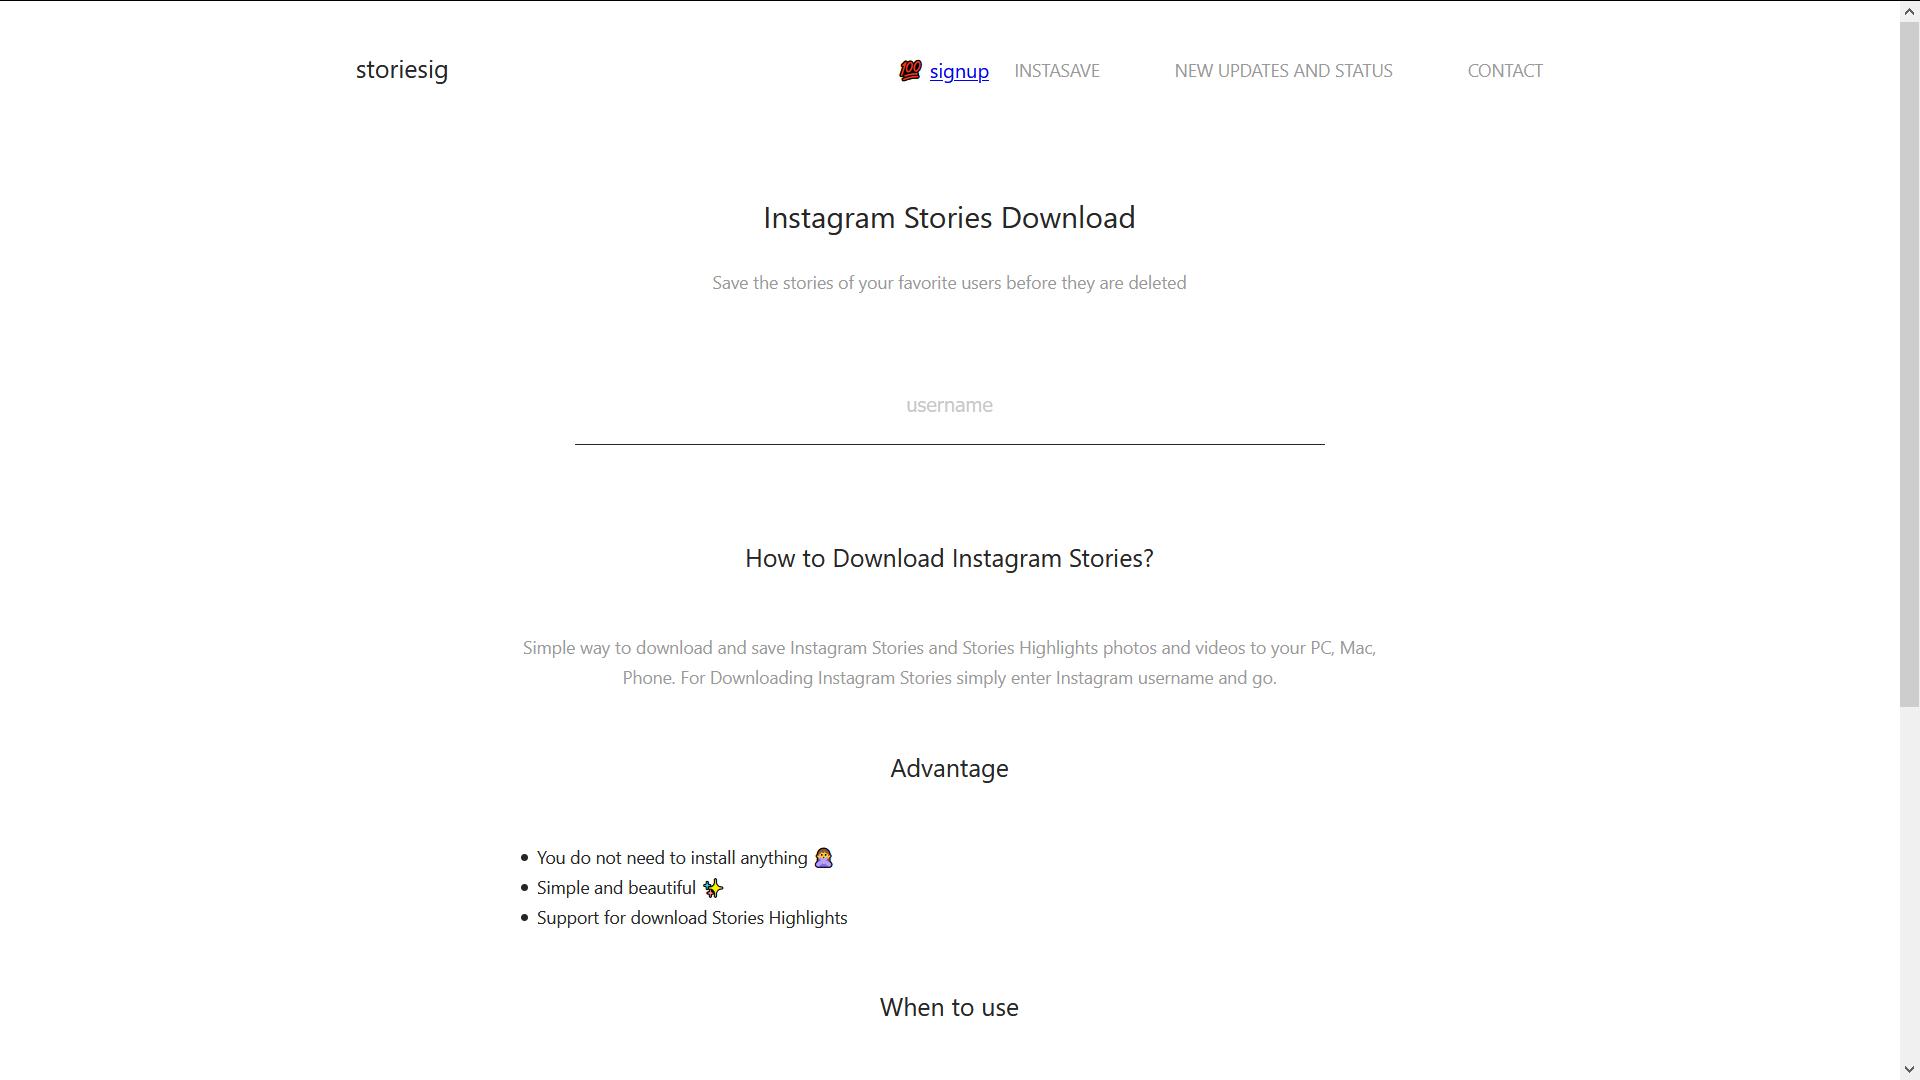 Storiesig.com